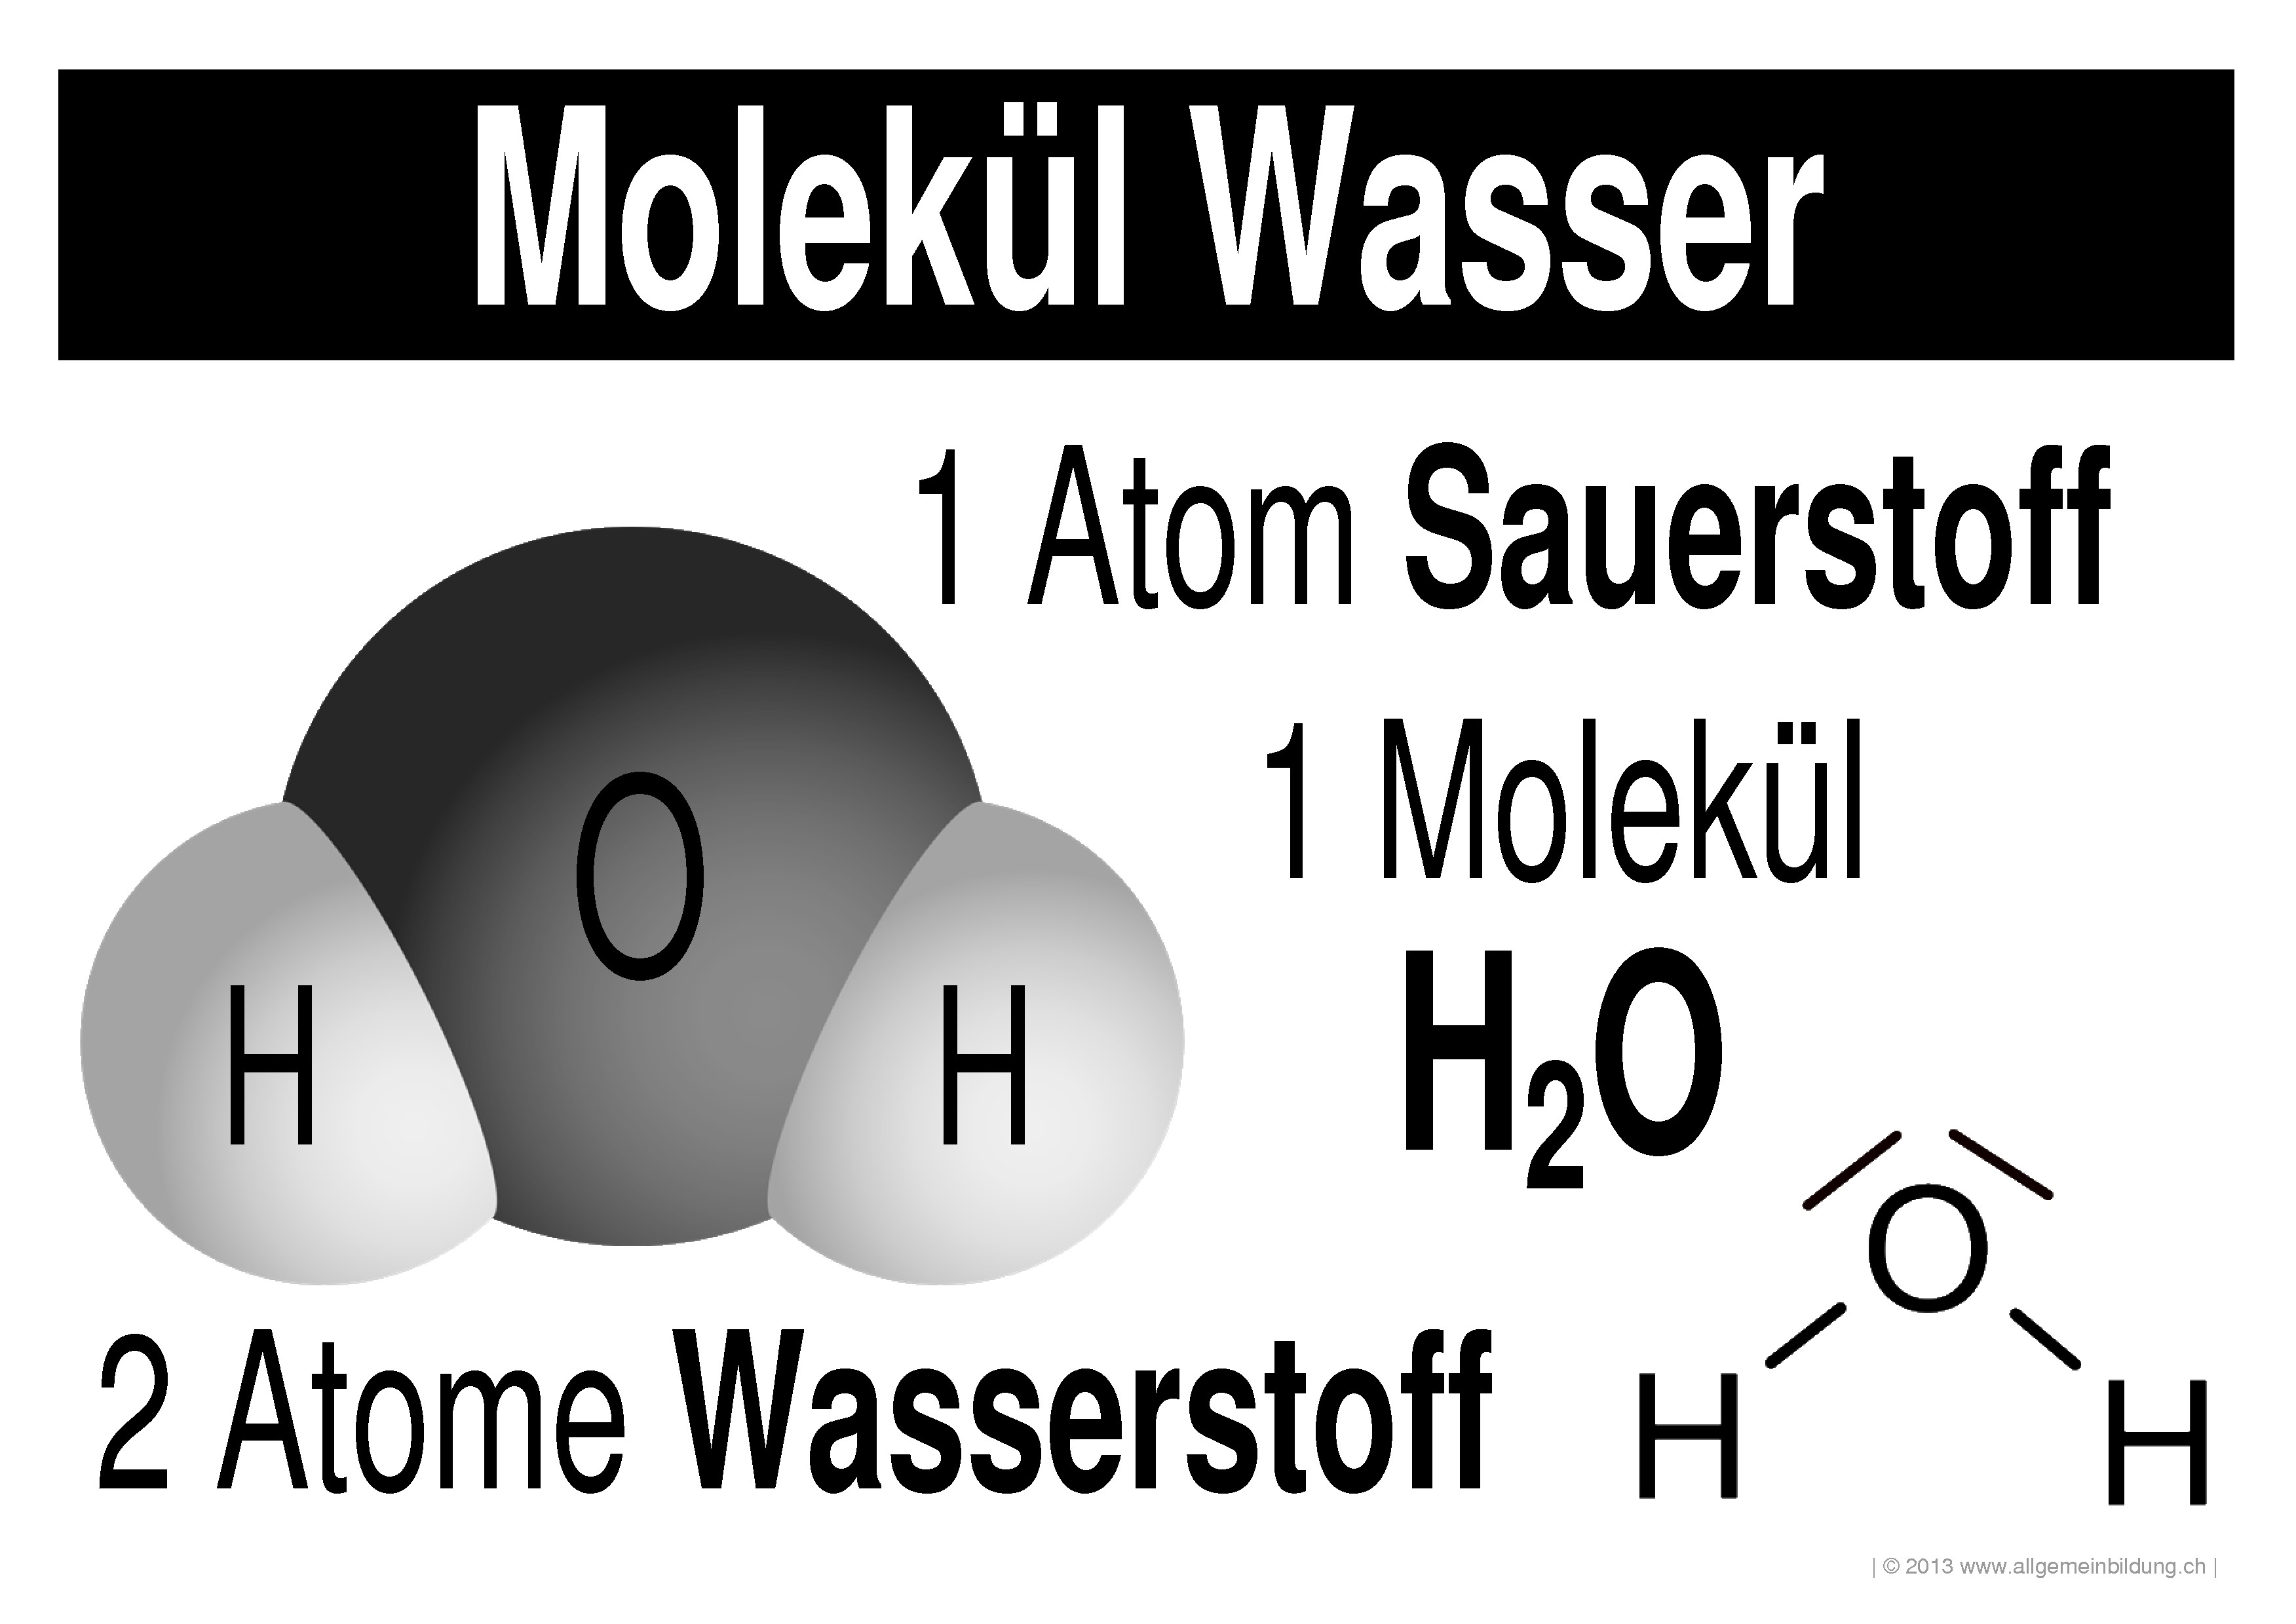 Fein Atome Und Moleküle Arbeitsblatt Galerie - Mathe Arbeitsblatt ...